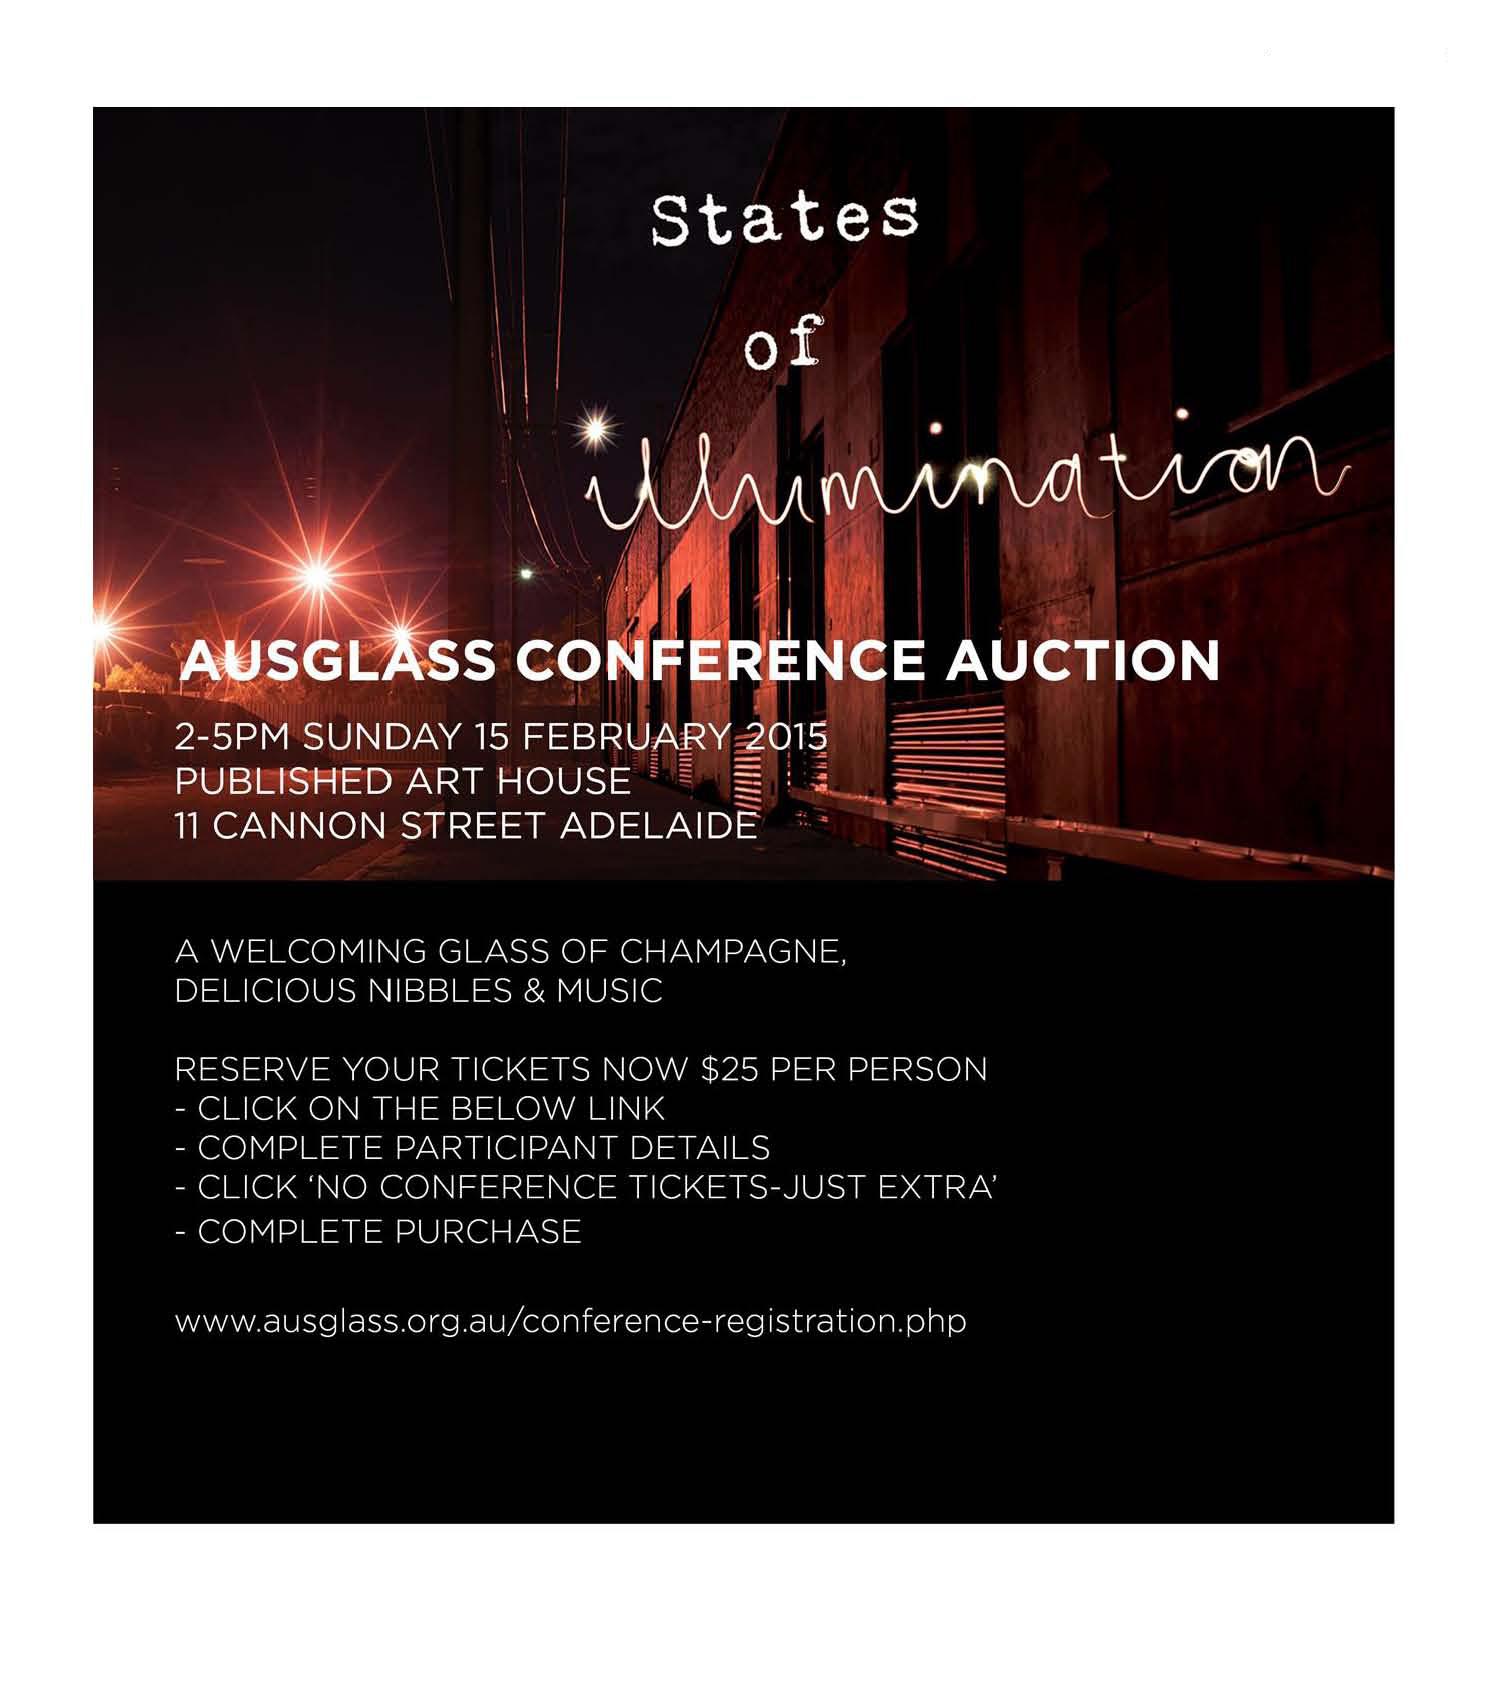 auction invite_Page_2.jpg